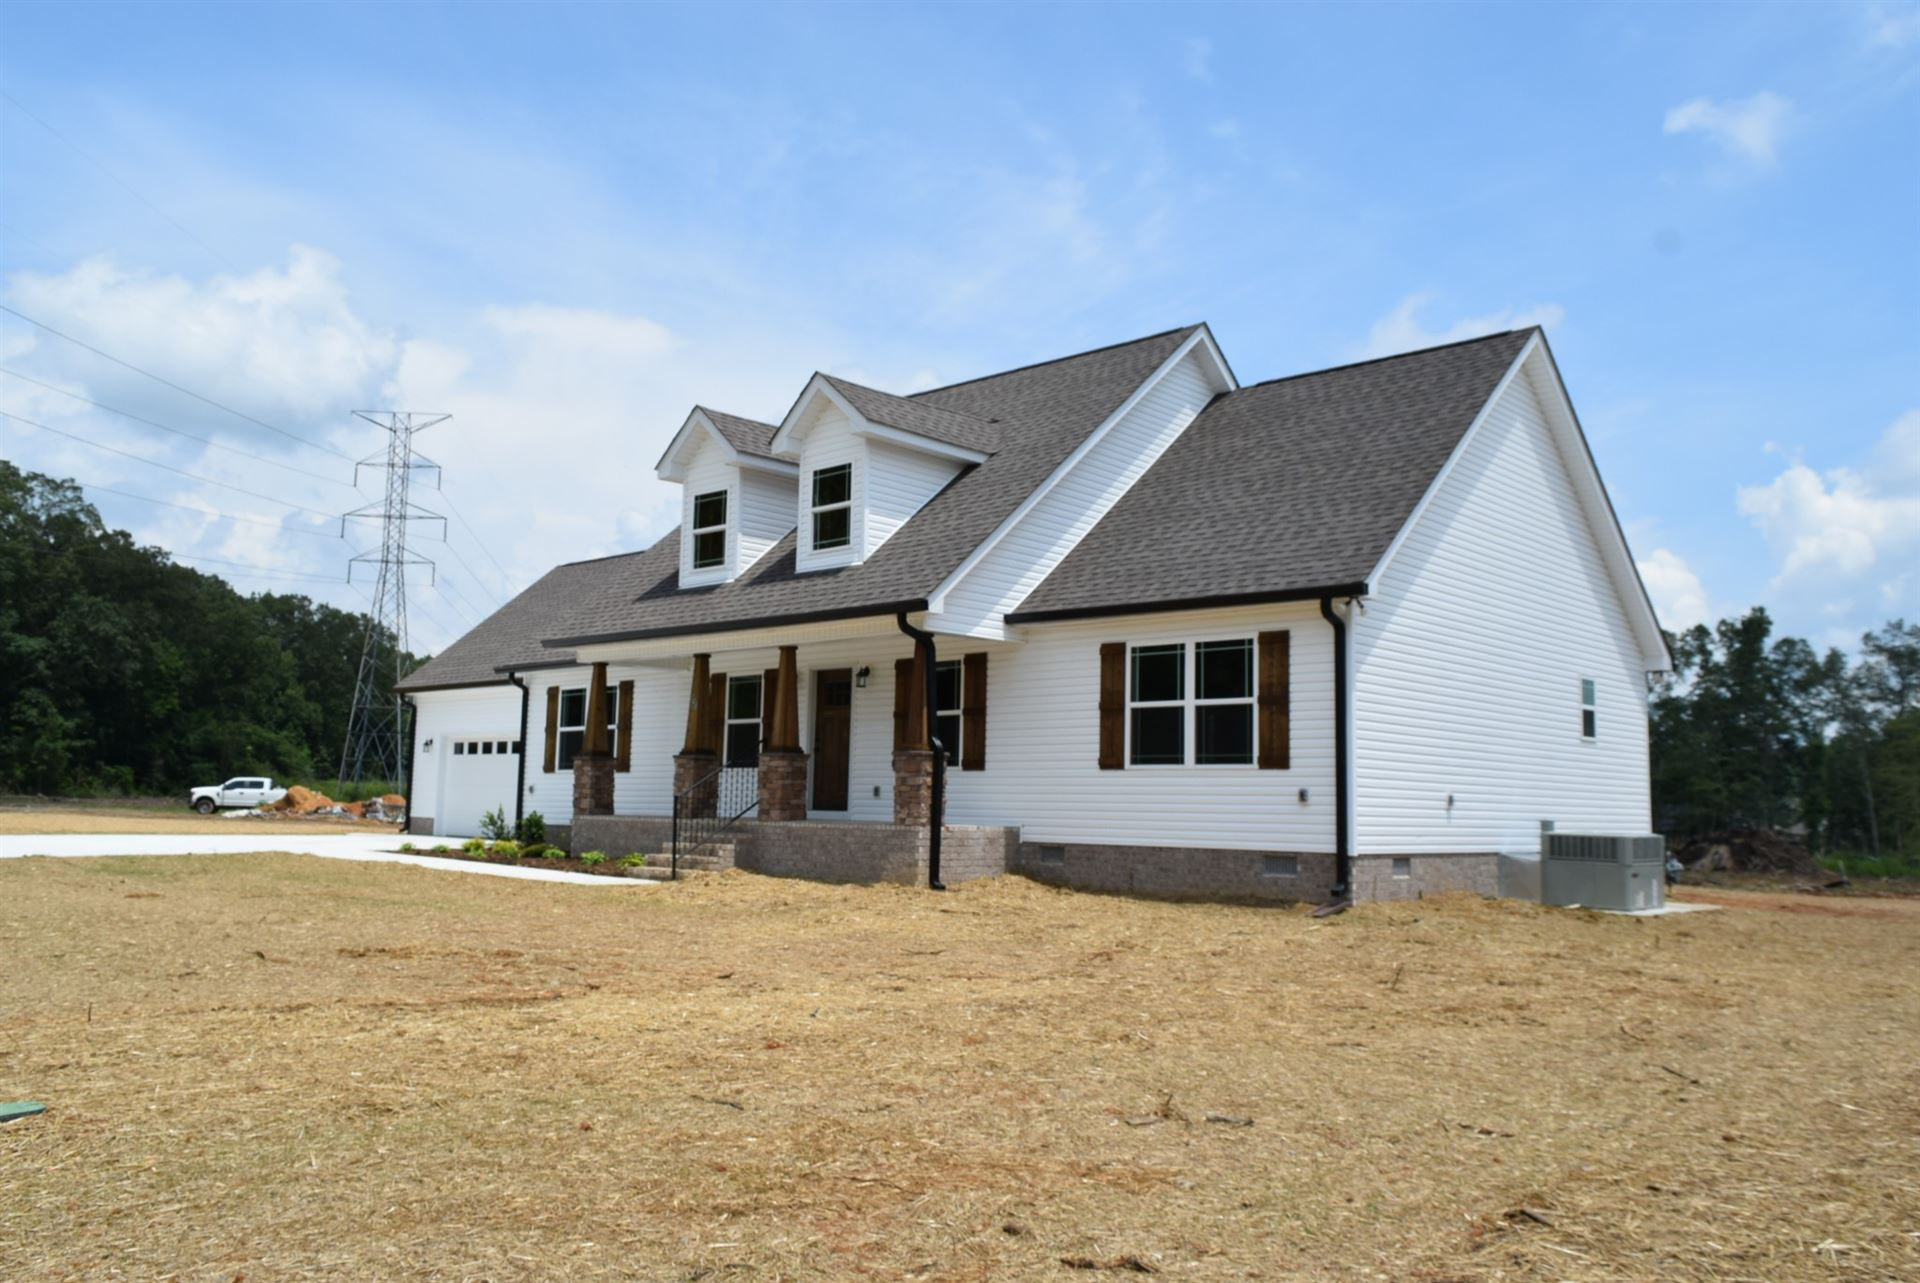 148 Riley Creek Road, Tullahoma, TN 37388 - MLS#: 2213735